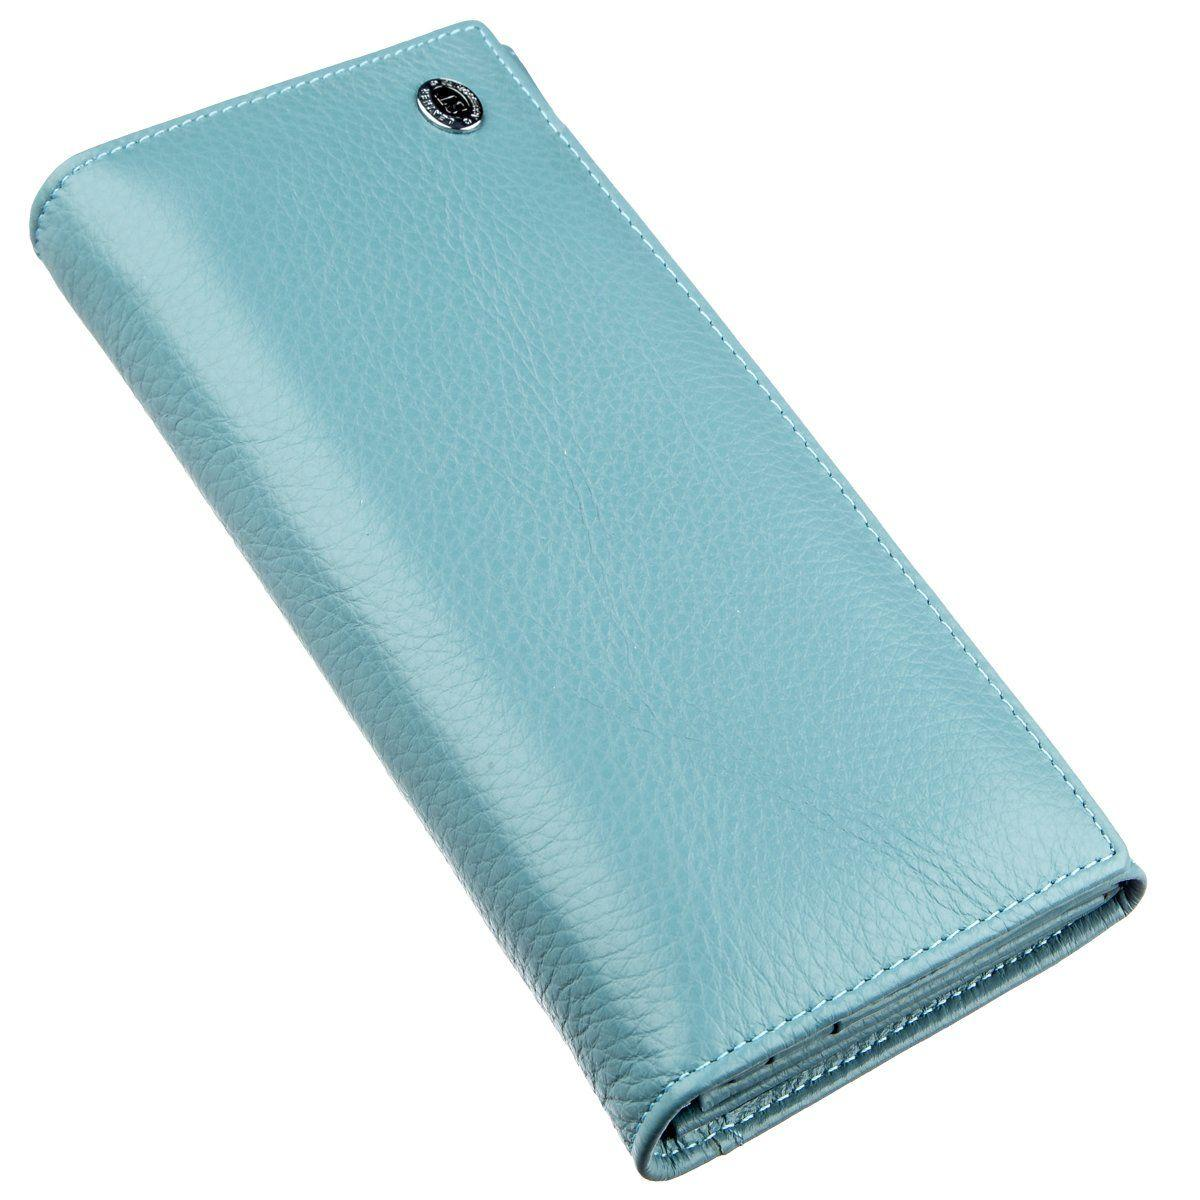 Яркий кошелек для женщин ST Leather 18876 Голубой, Голубой